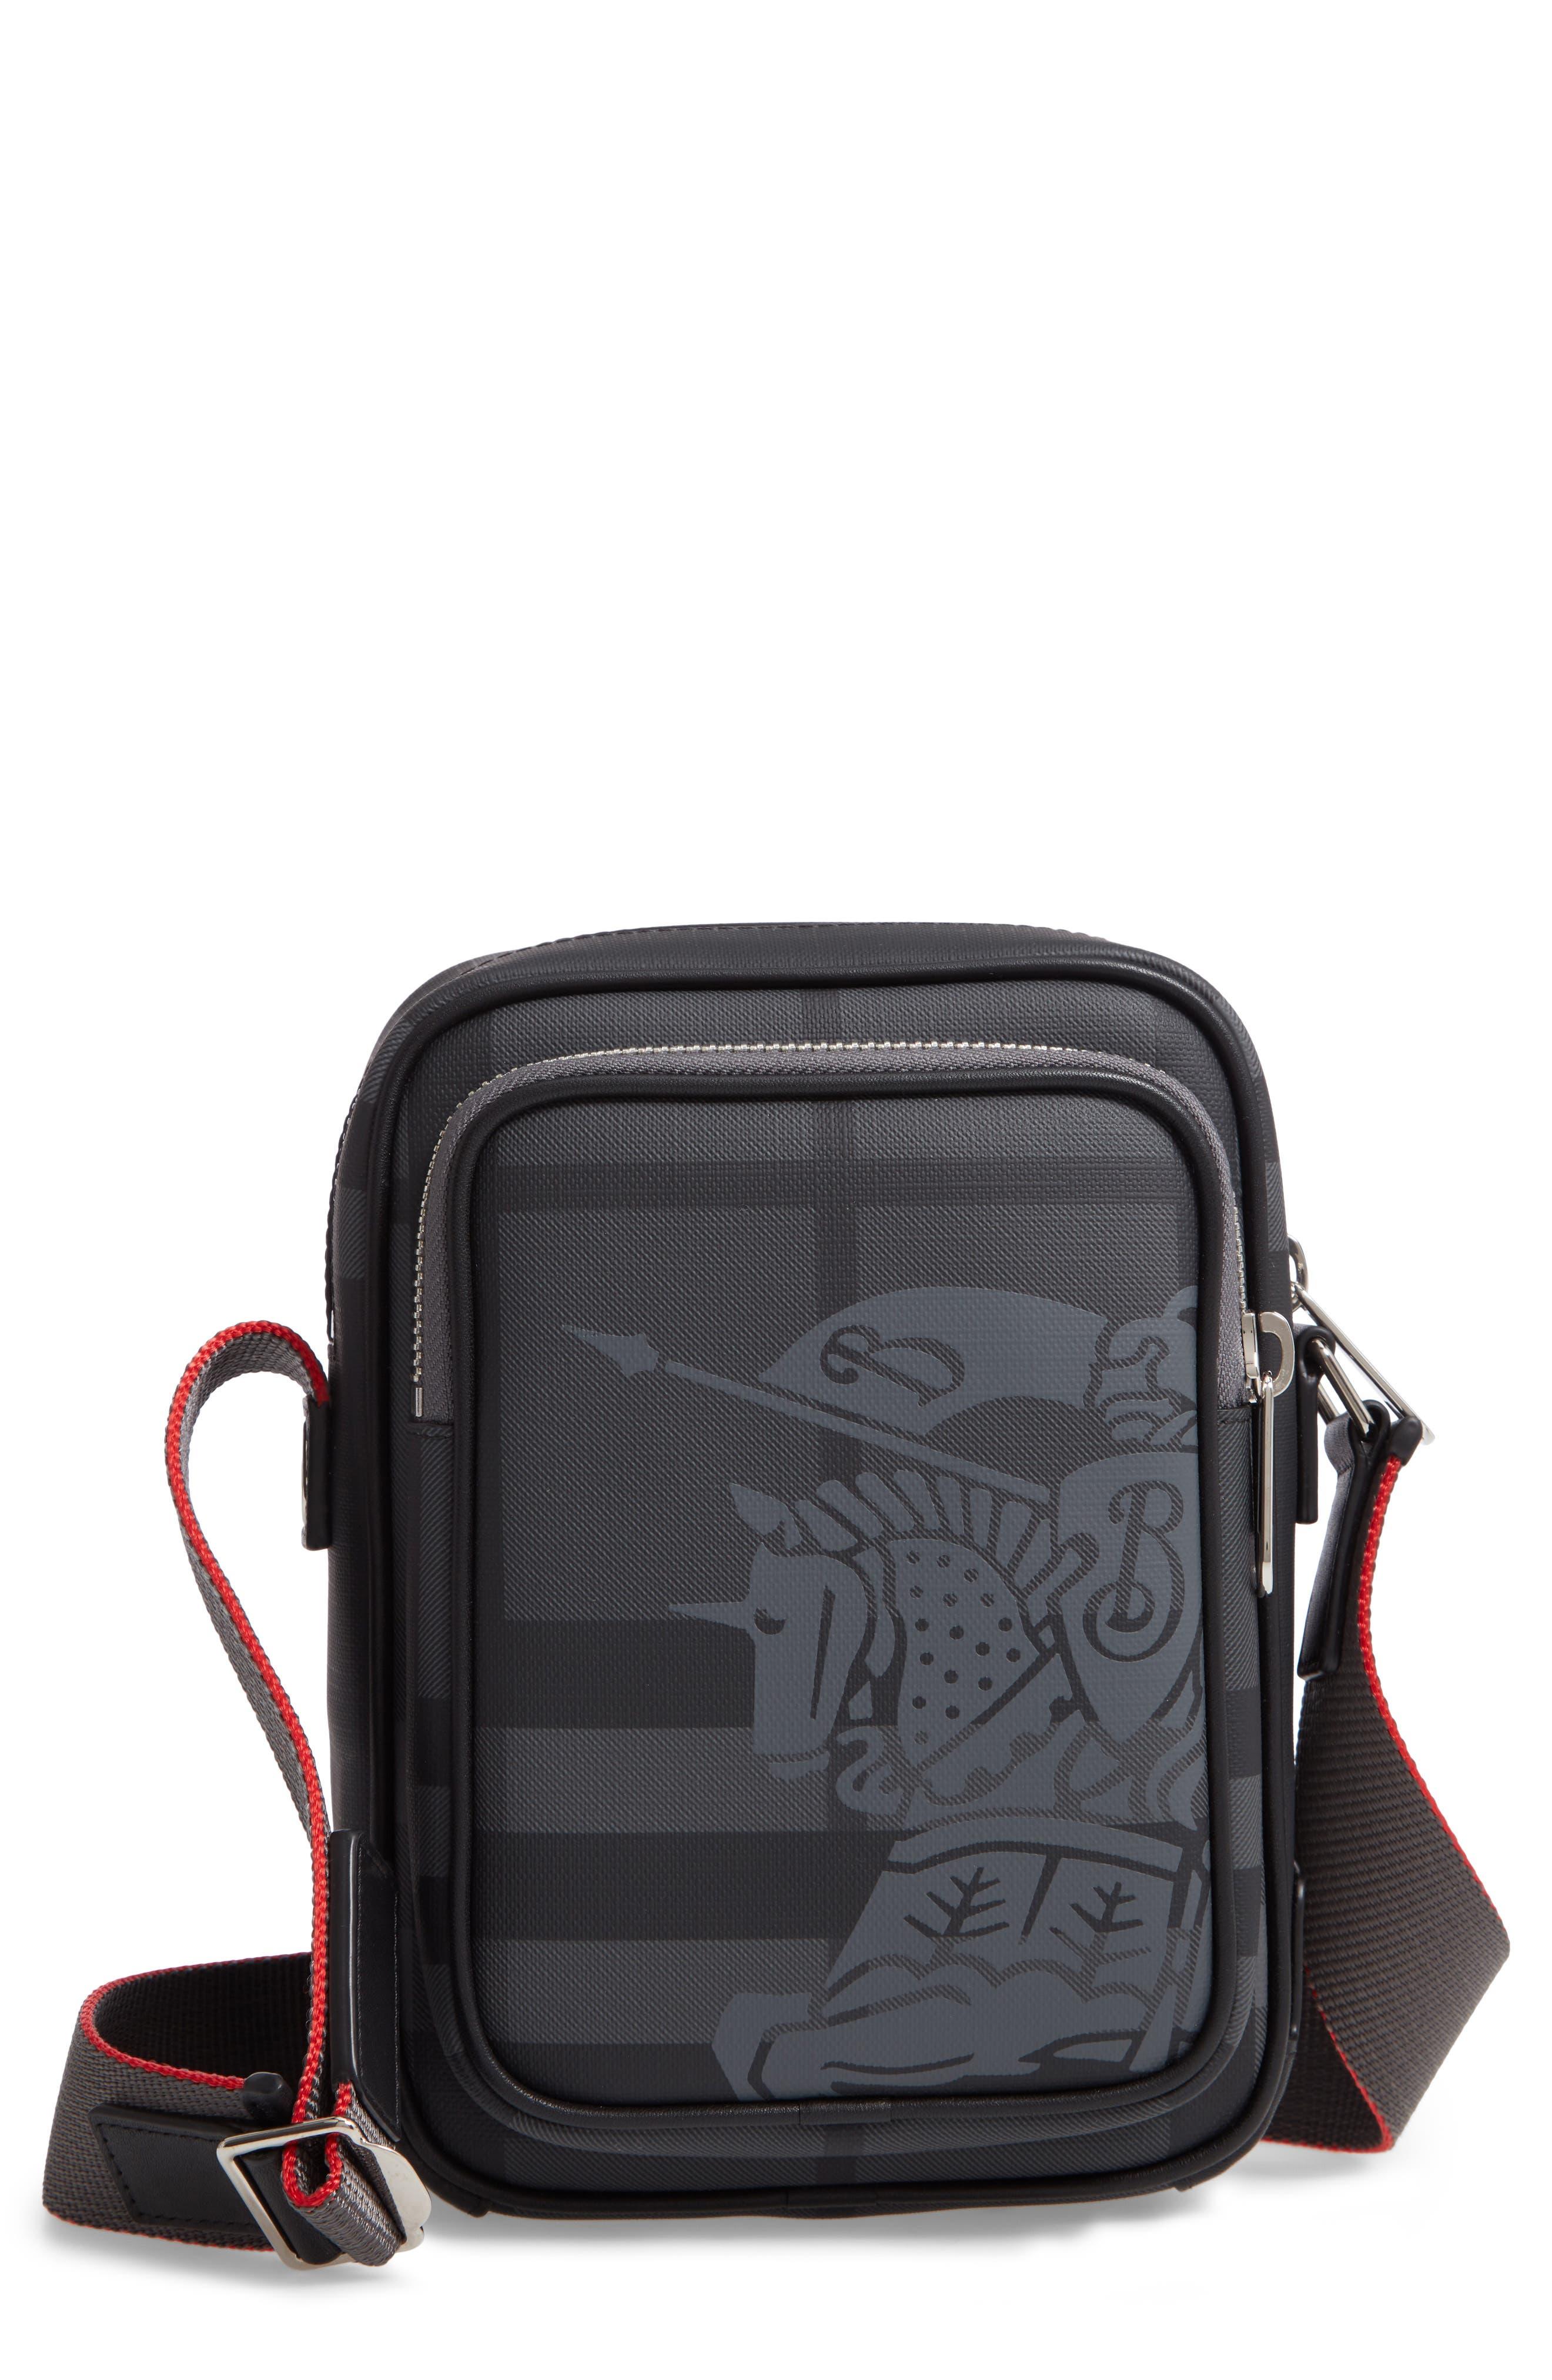 Freddie London Check Compact Messenger Bag, Main, color, CHARCOAL BLACK